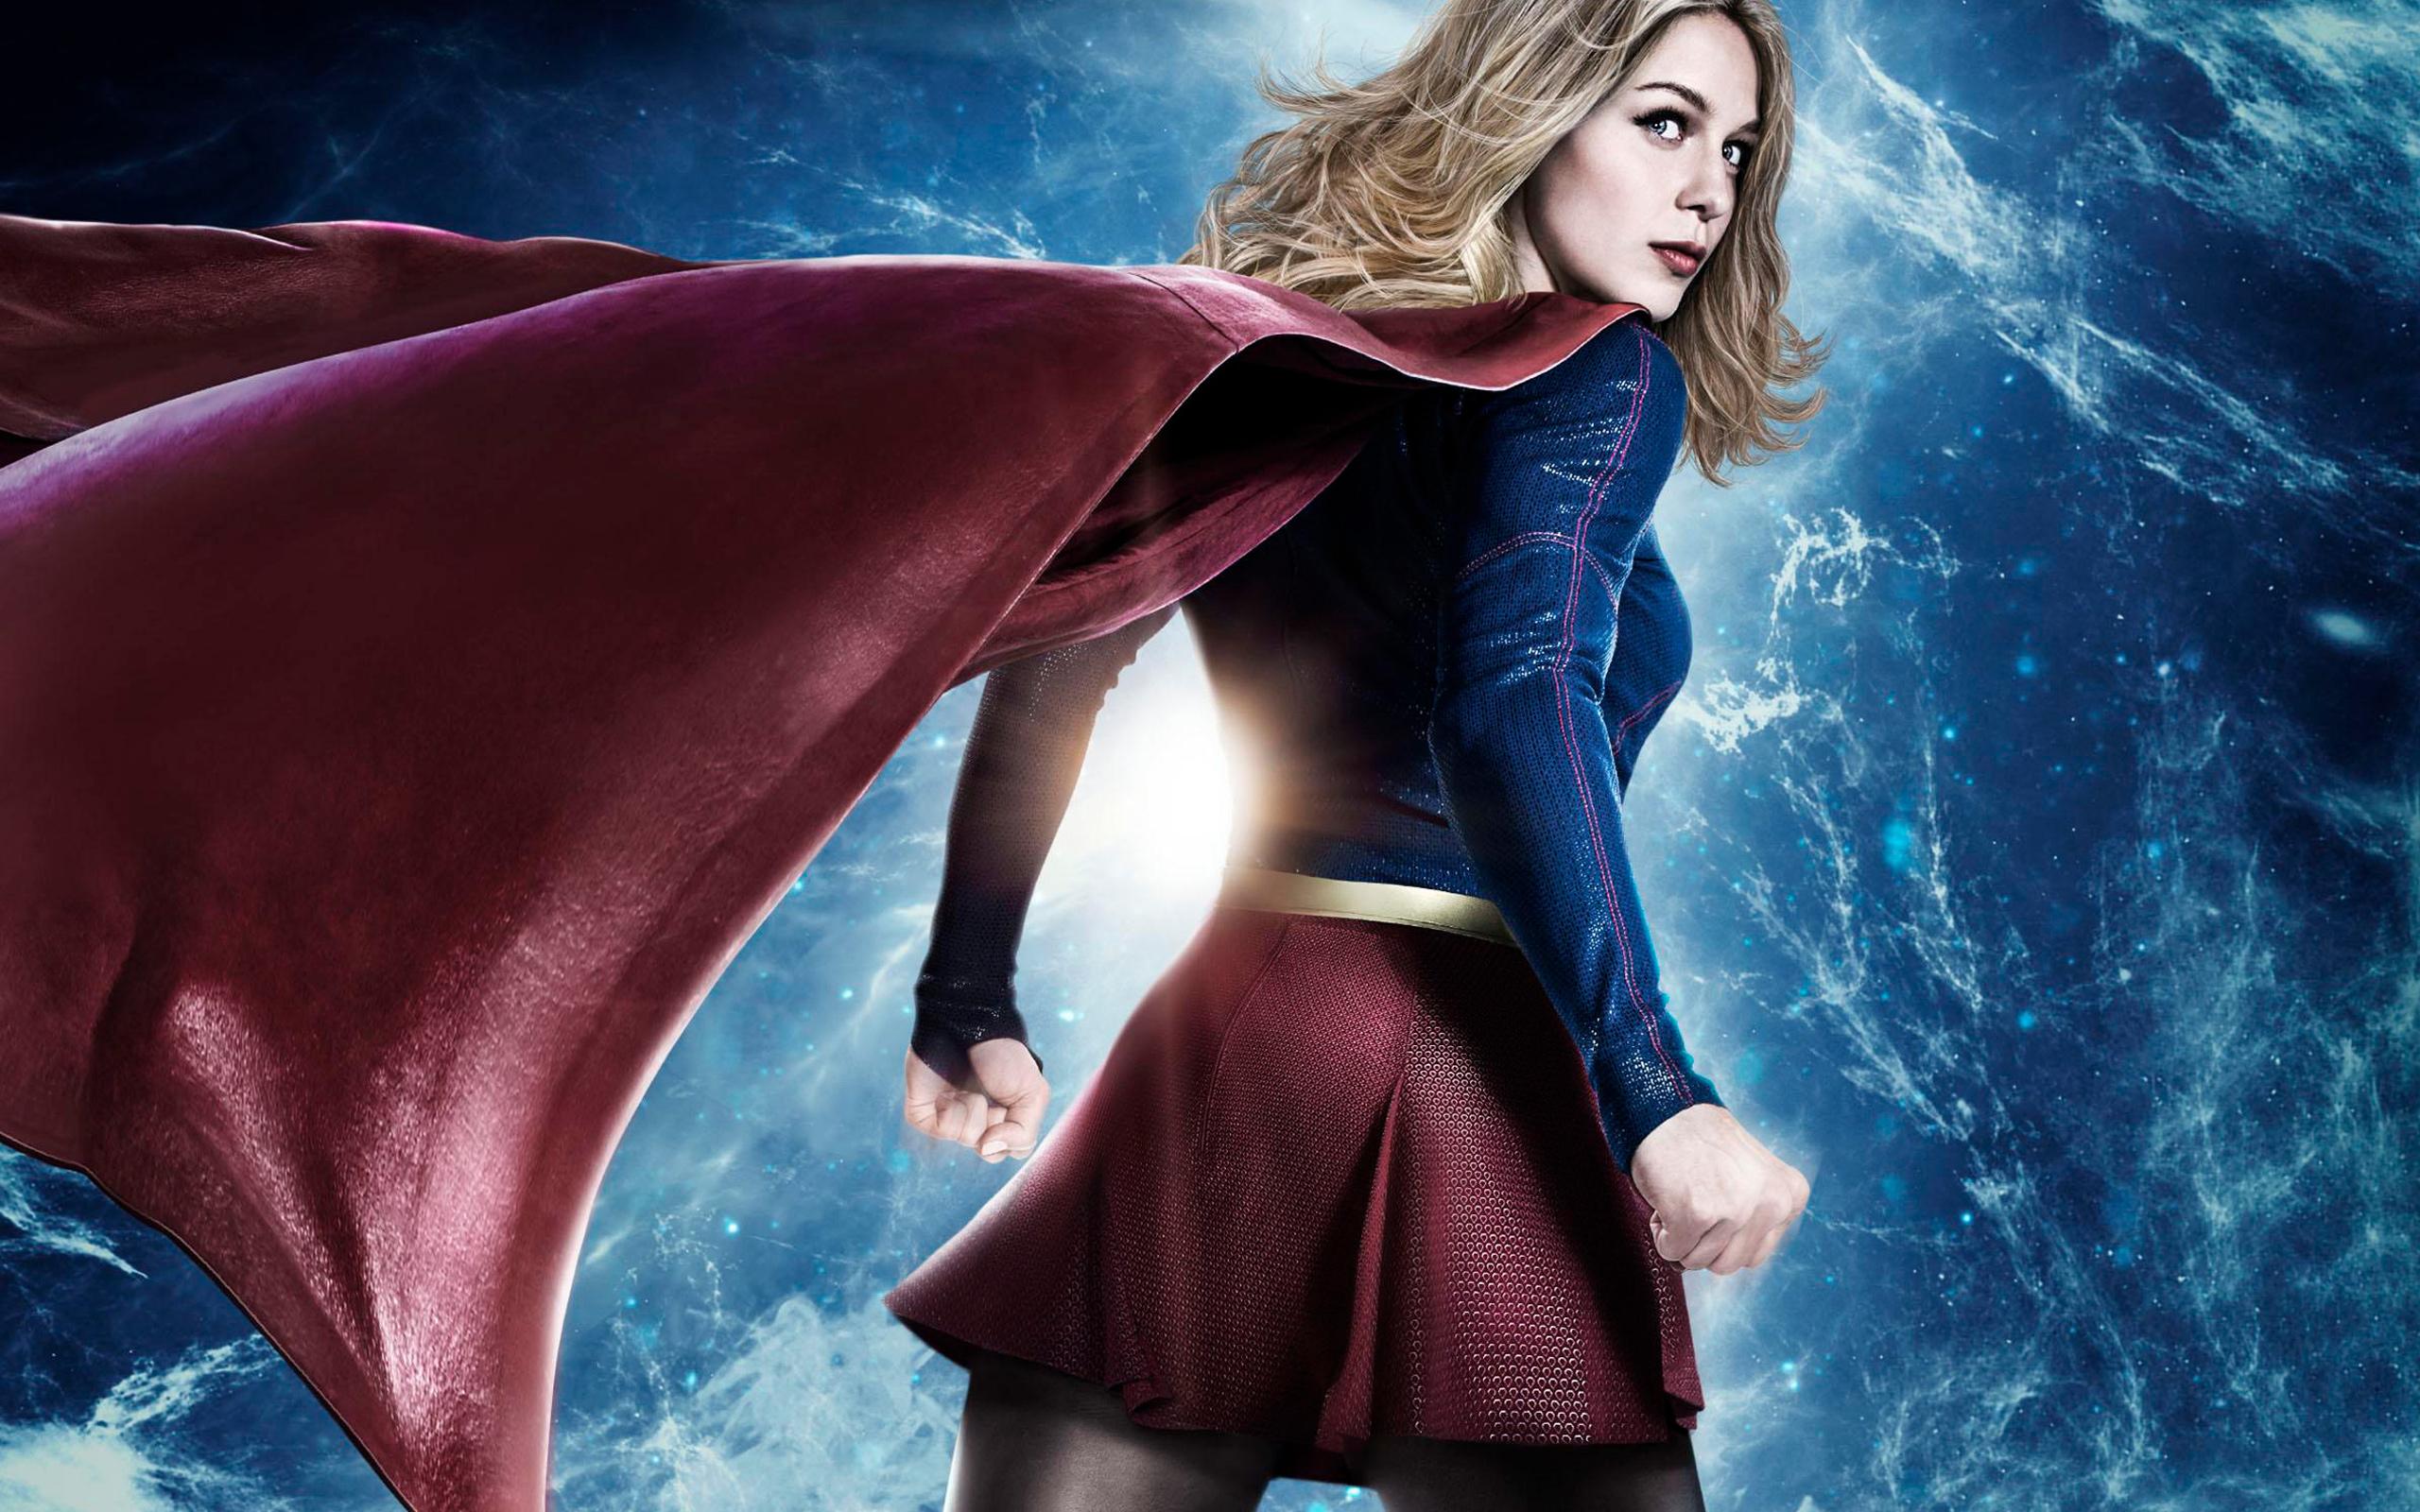 1080x1920 Hd Girl Wallpaper Supergirl Season 3 Wallpapers Hd Wallpapers Id 20370